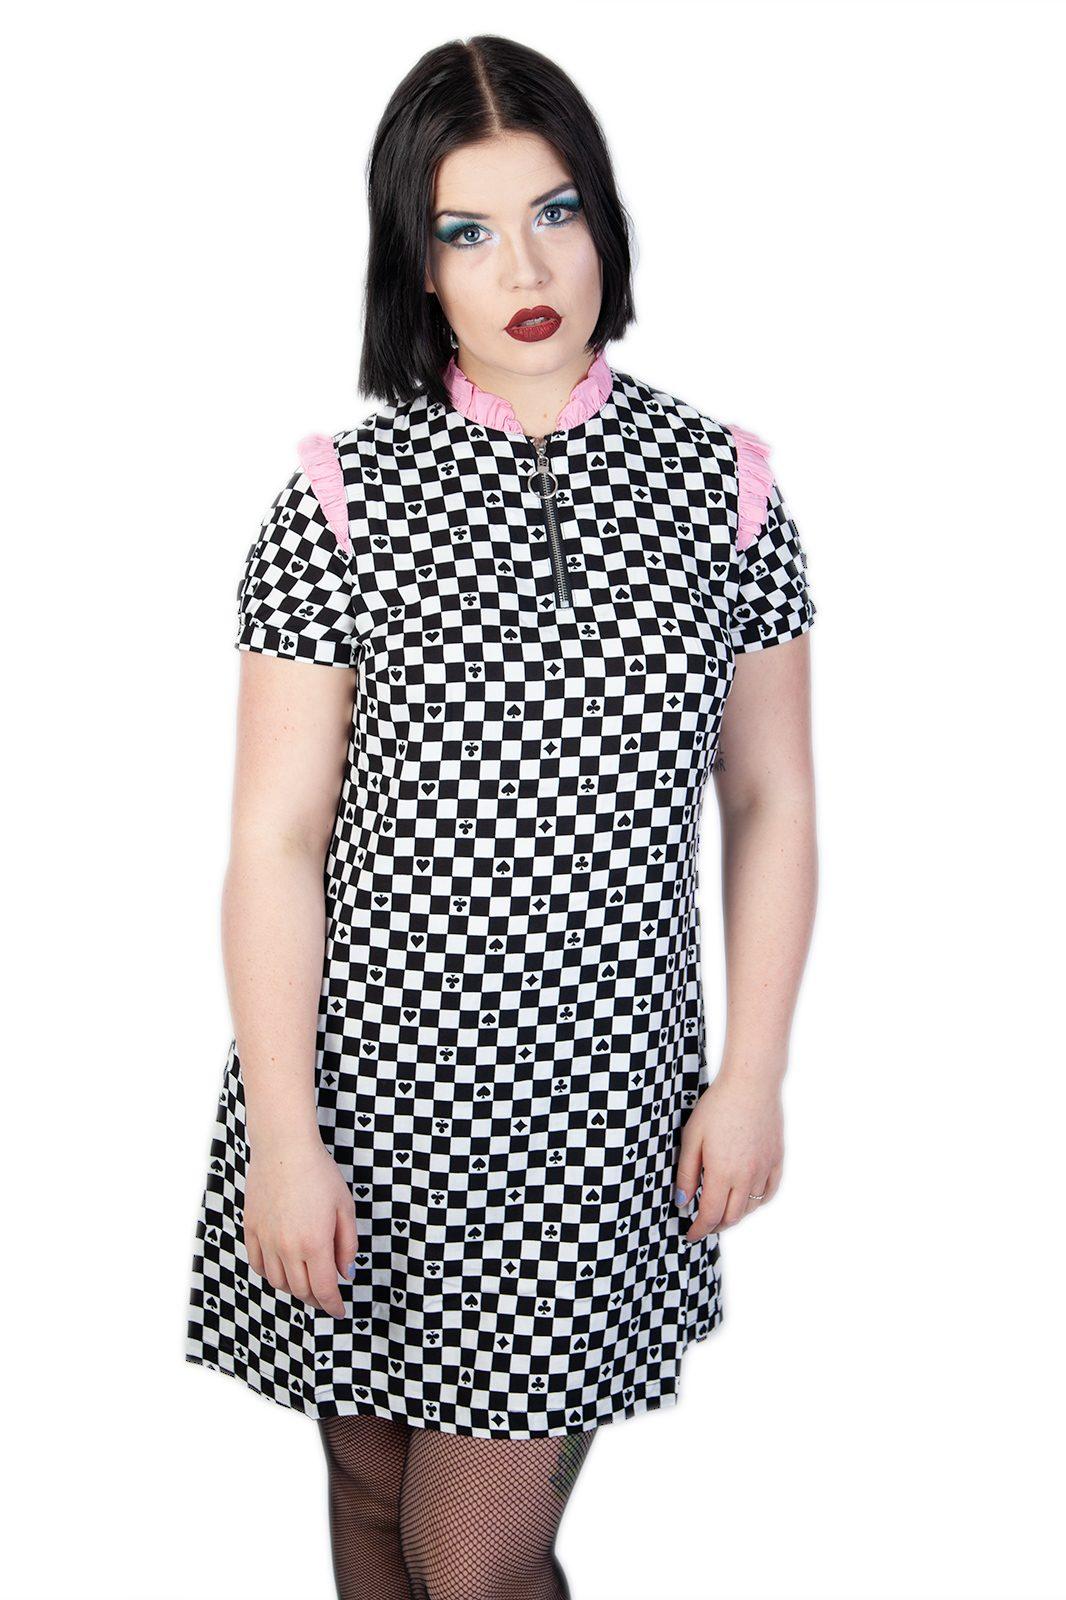 Pokerface Mini Dress